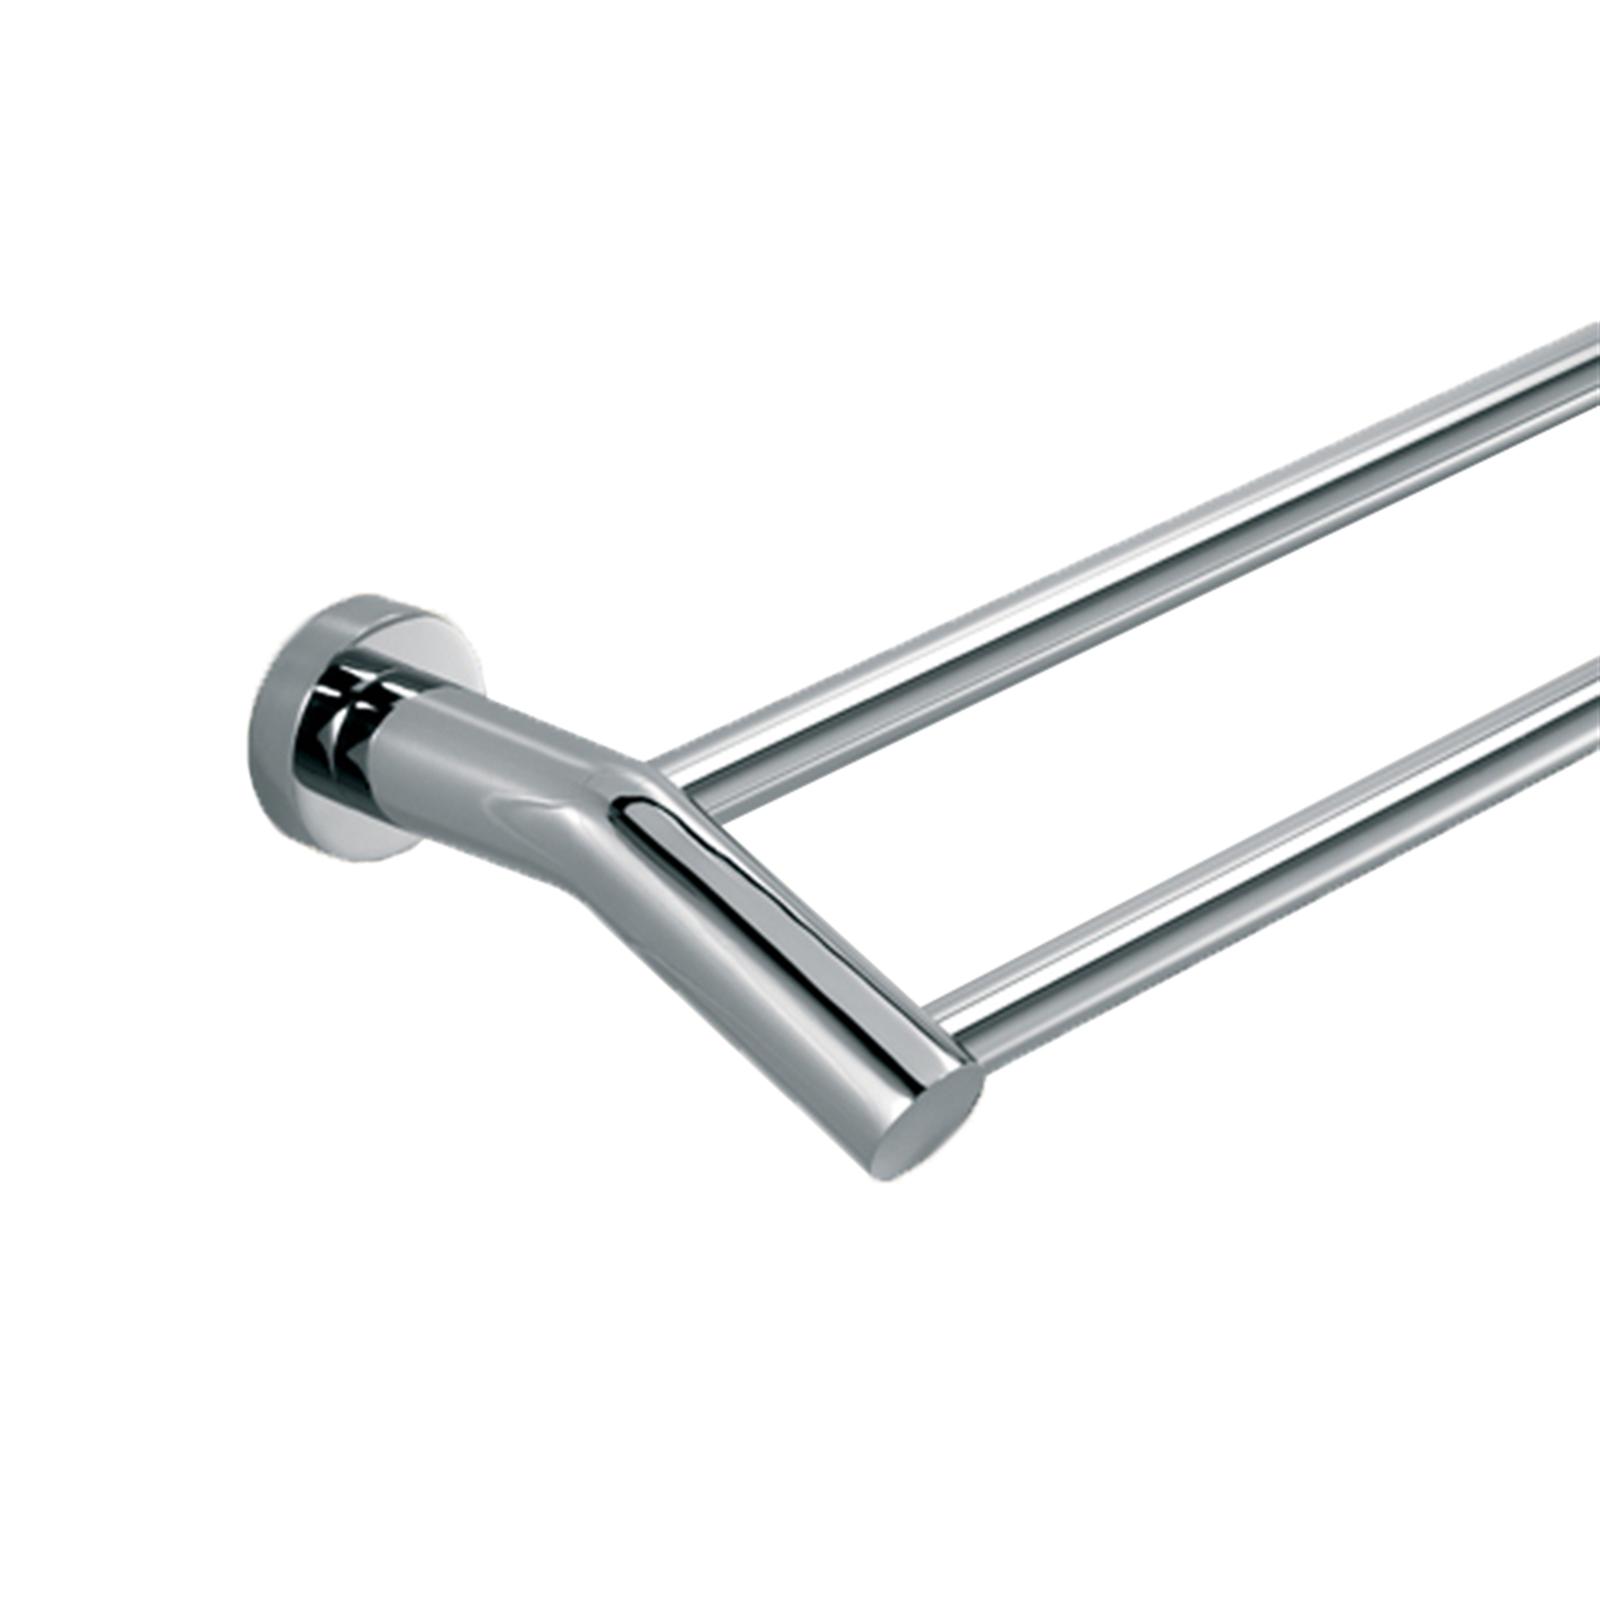 Caroma 600mm Chrome Double Towel Rail